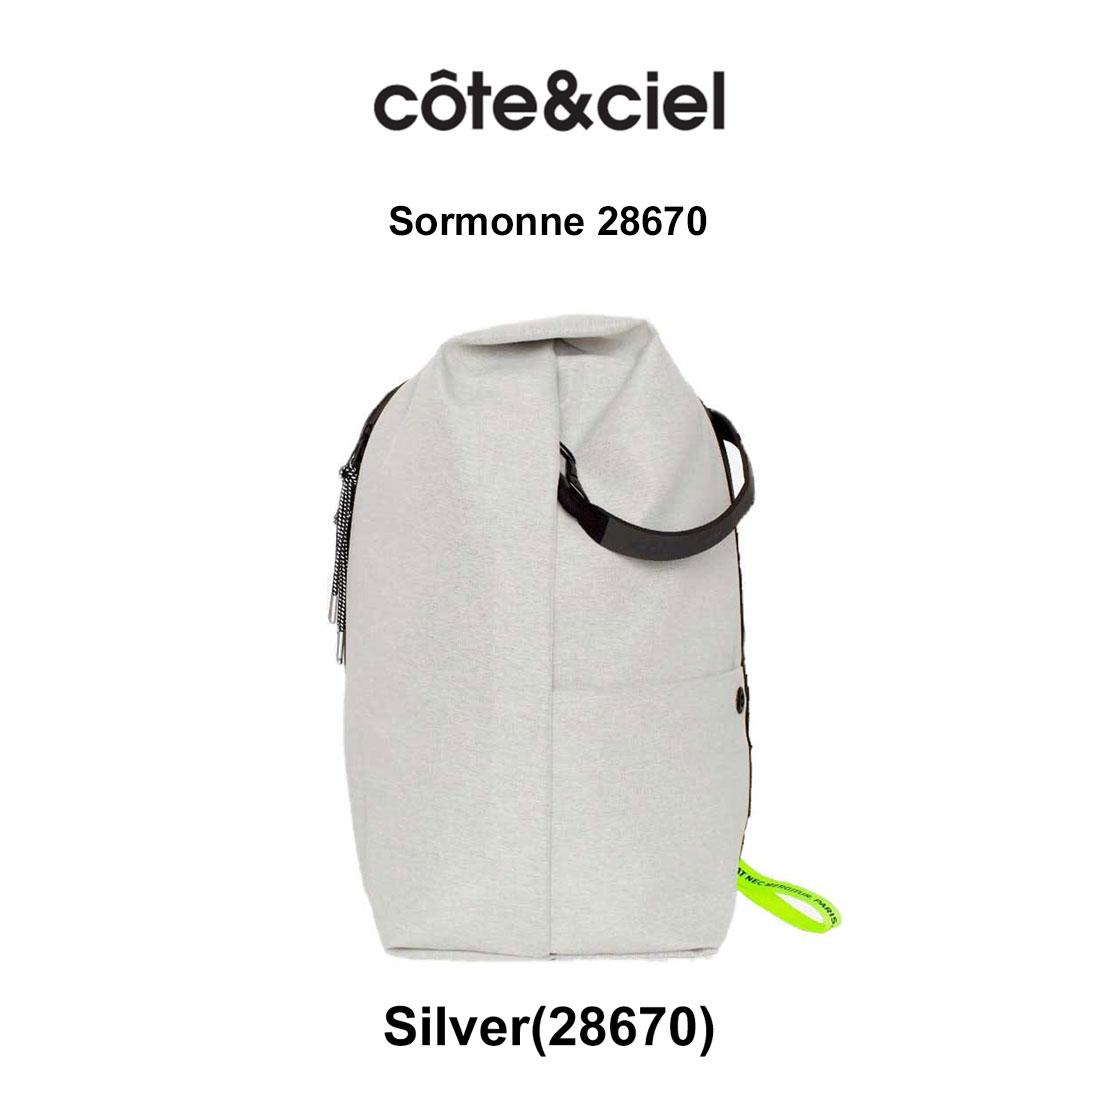 Cote&Ciel(コートエシエル)バックパック リュック 通勤通学 ノートPC 13インチ Sormonne 28670